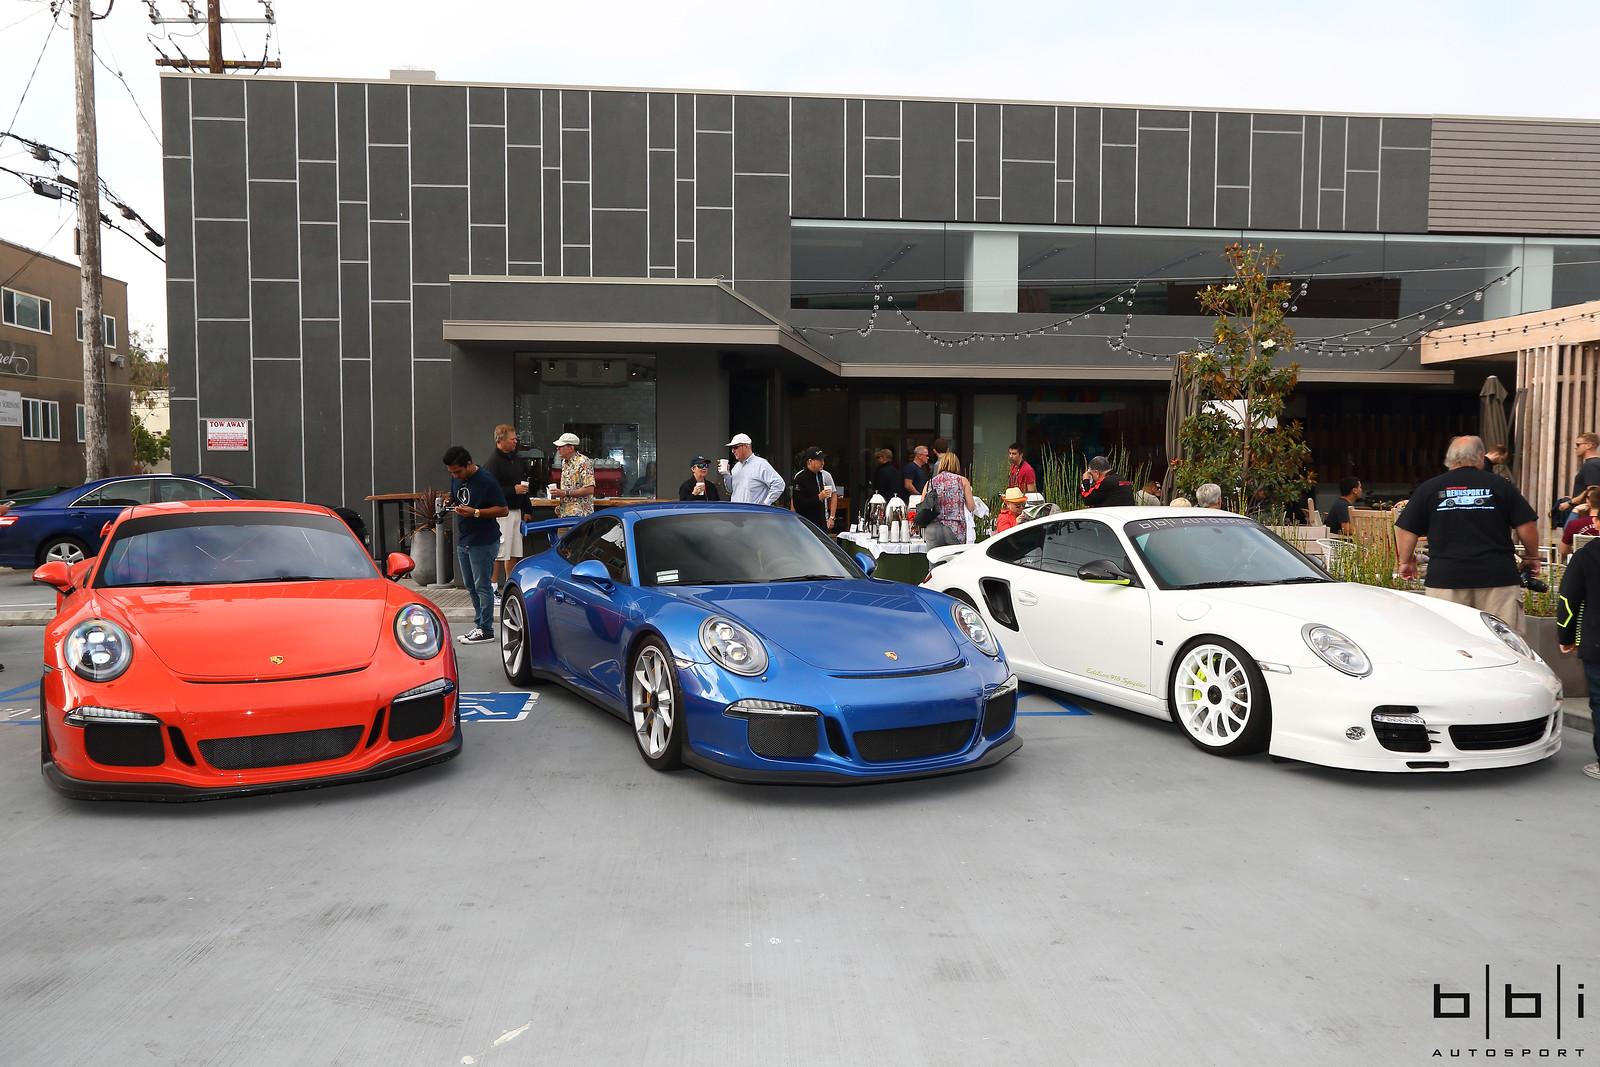 Cars U0026 Coffee La Jolla Porsche Day Photo Coverage By BBi Autosport